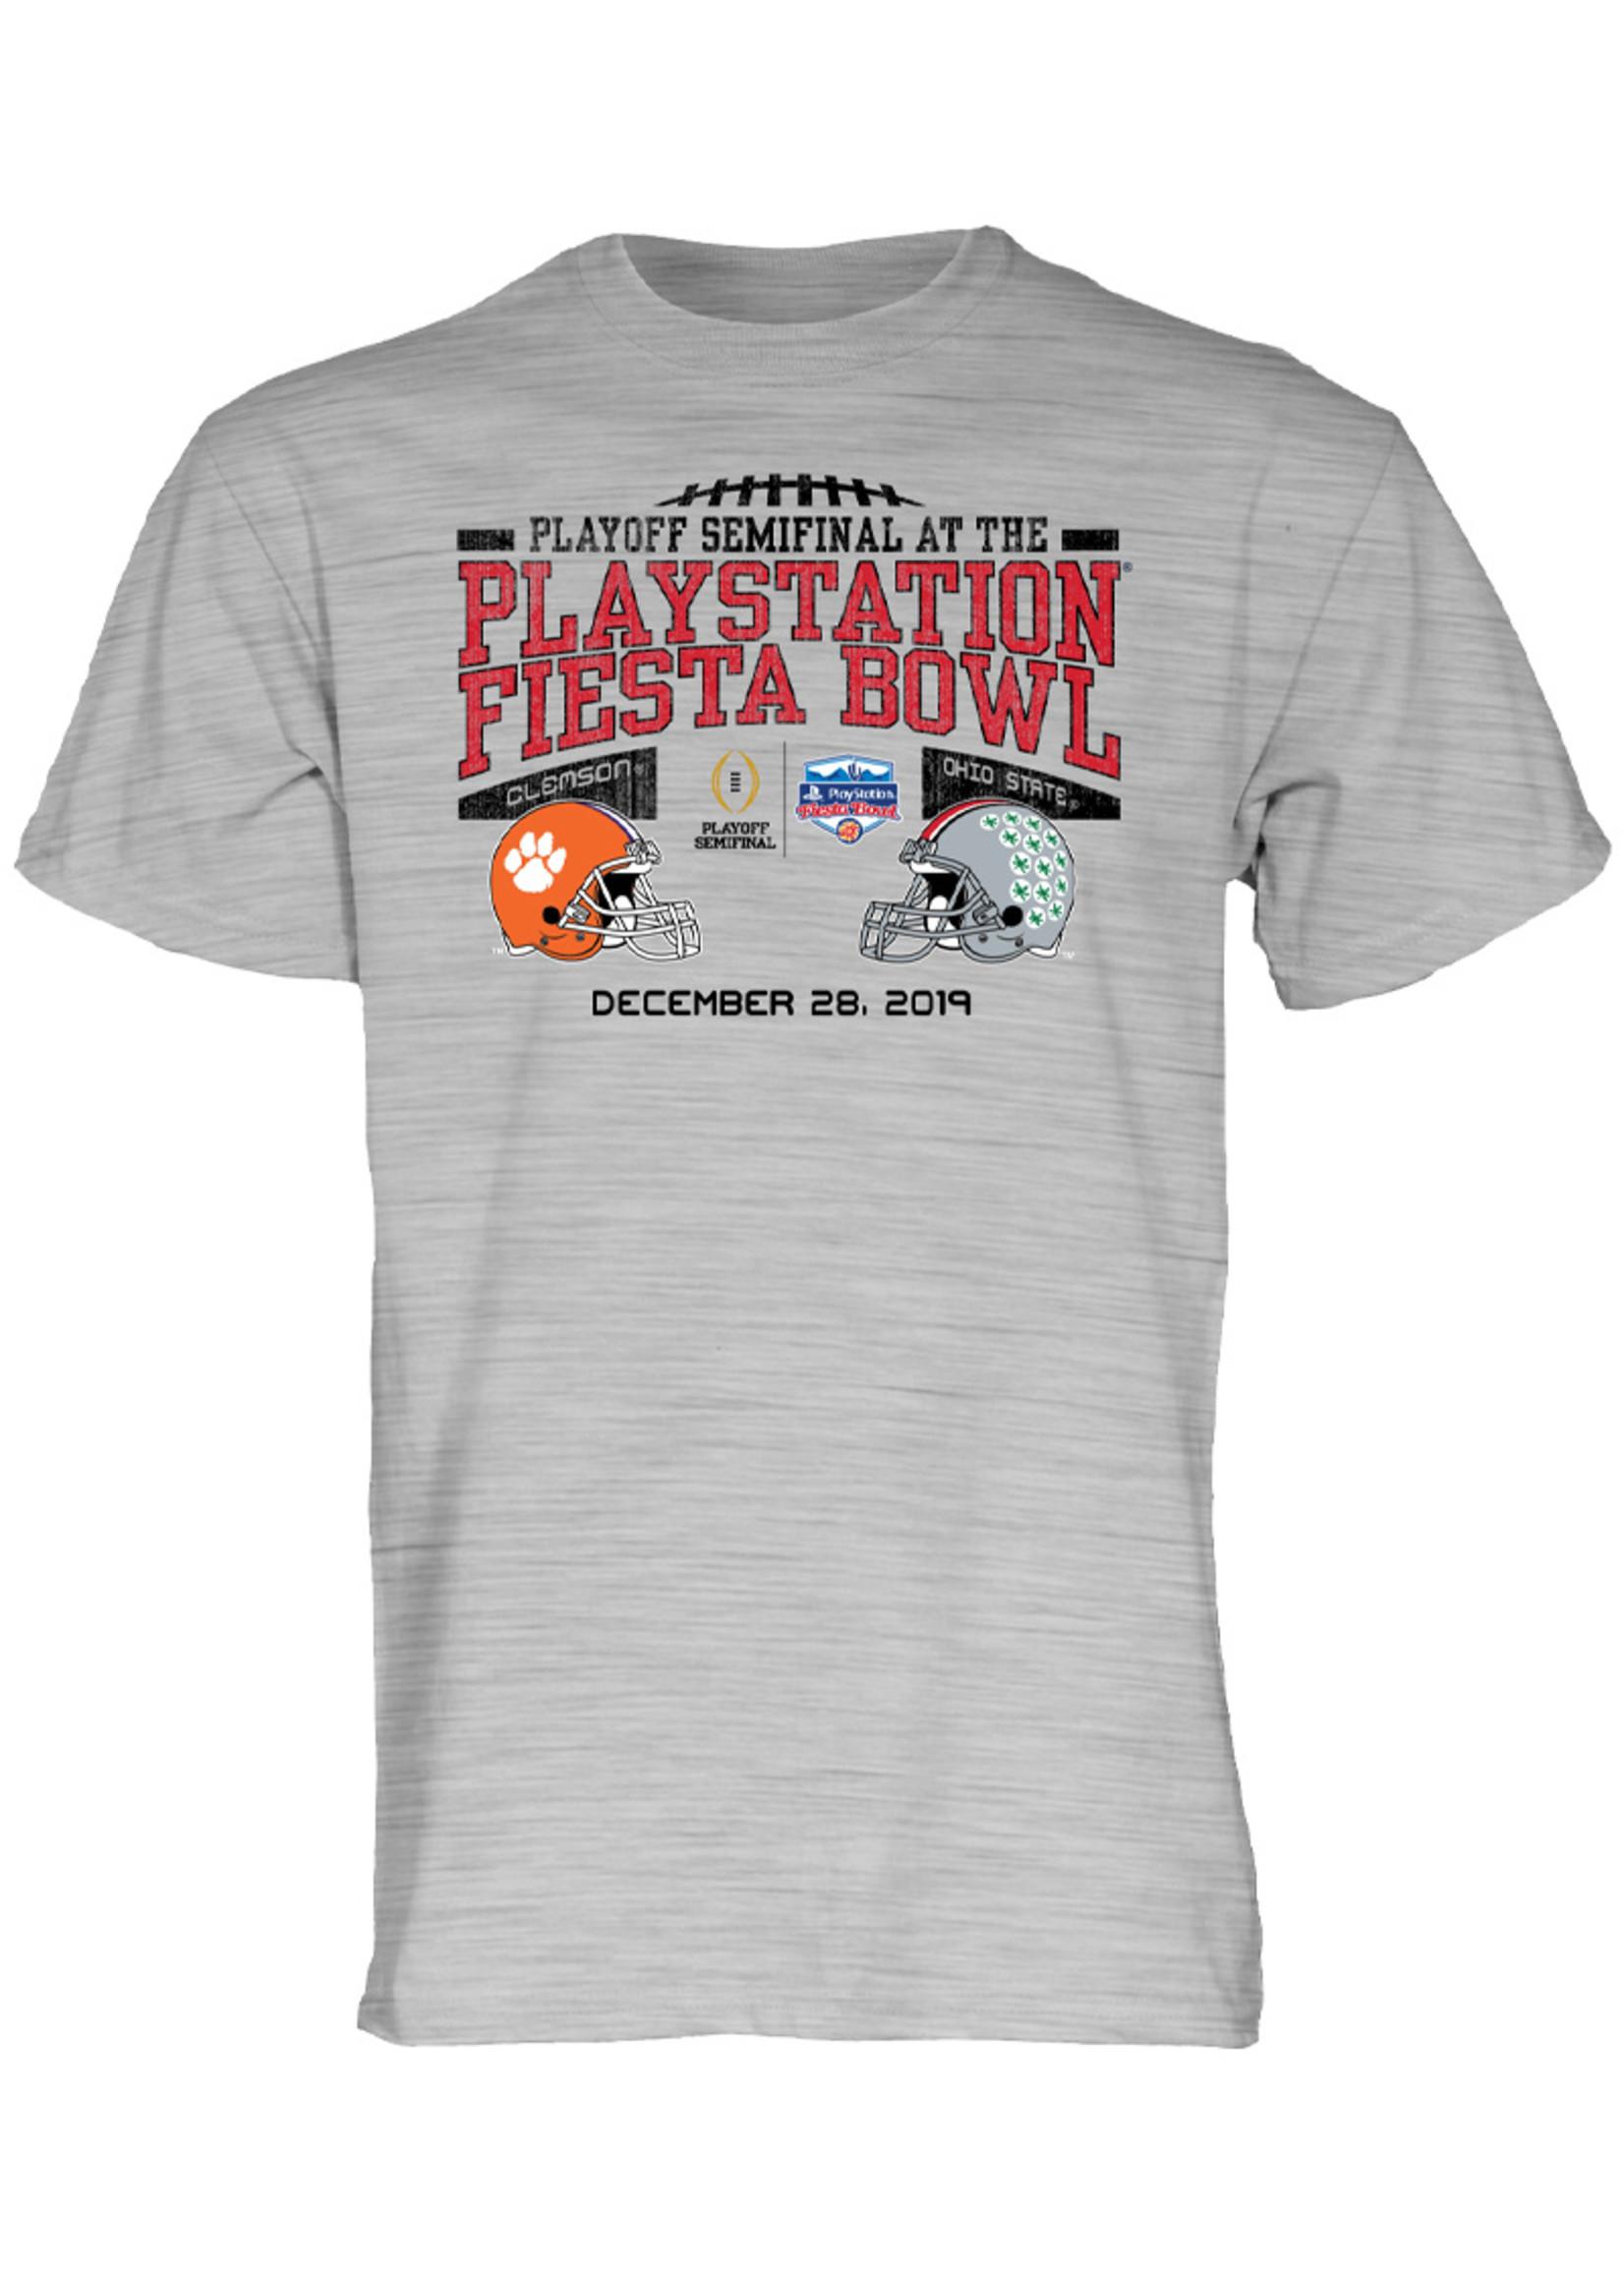 Ohio State Buckeyes vs. Clemson Tigers CFP 2019 Fiesta Bowl T-Shirt